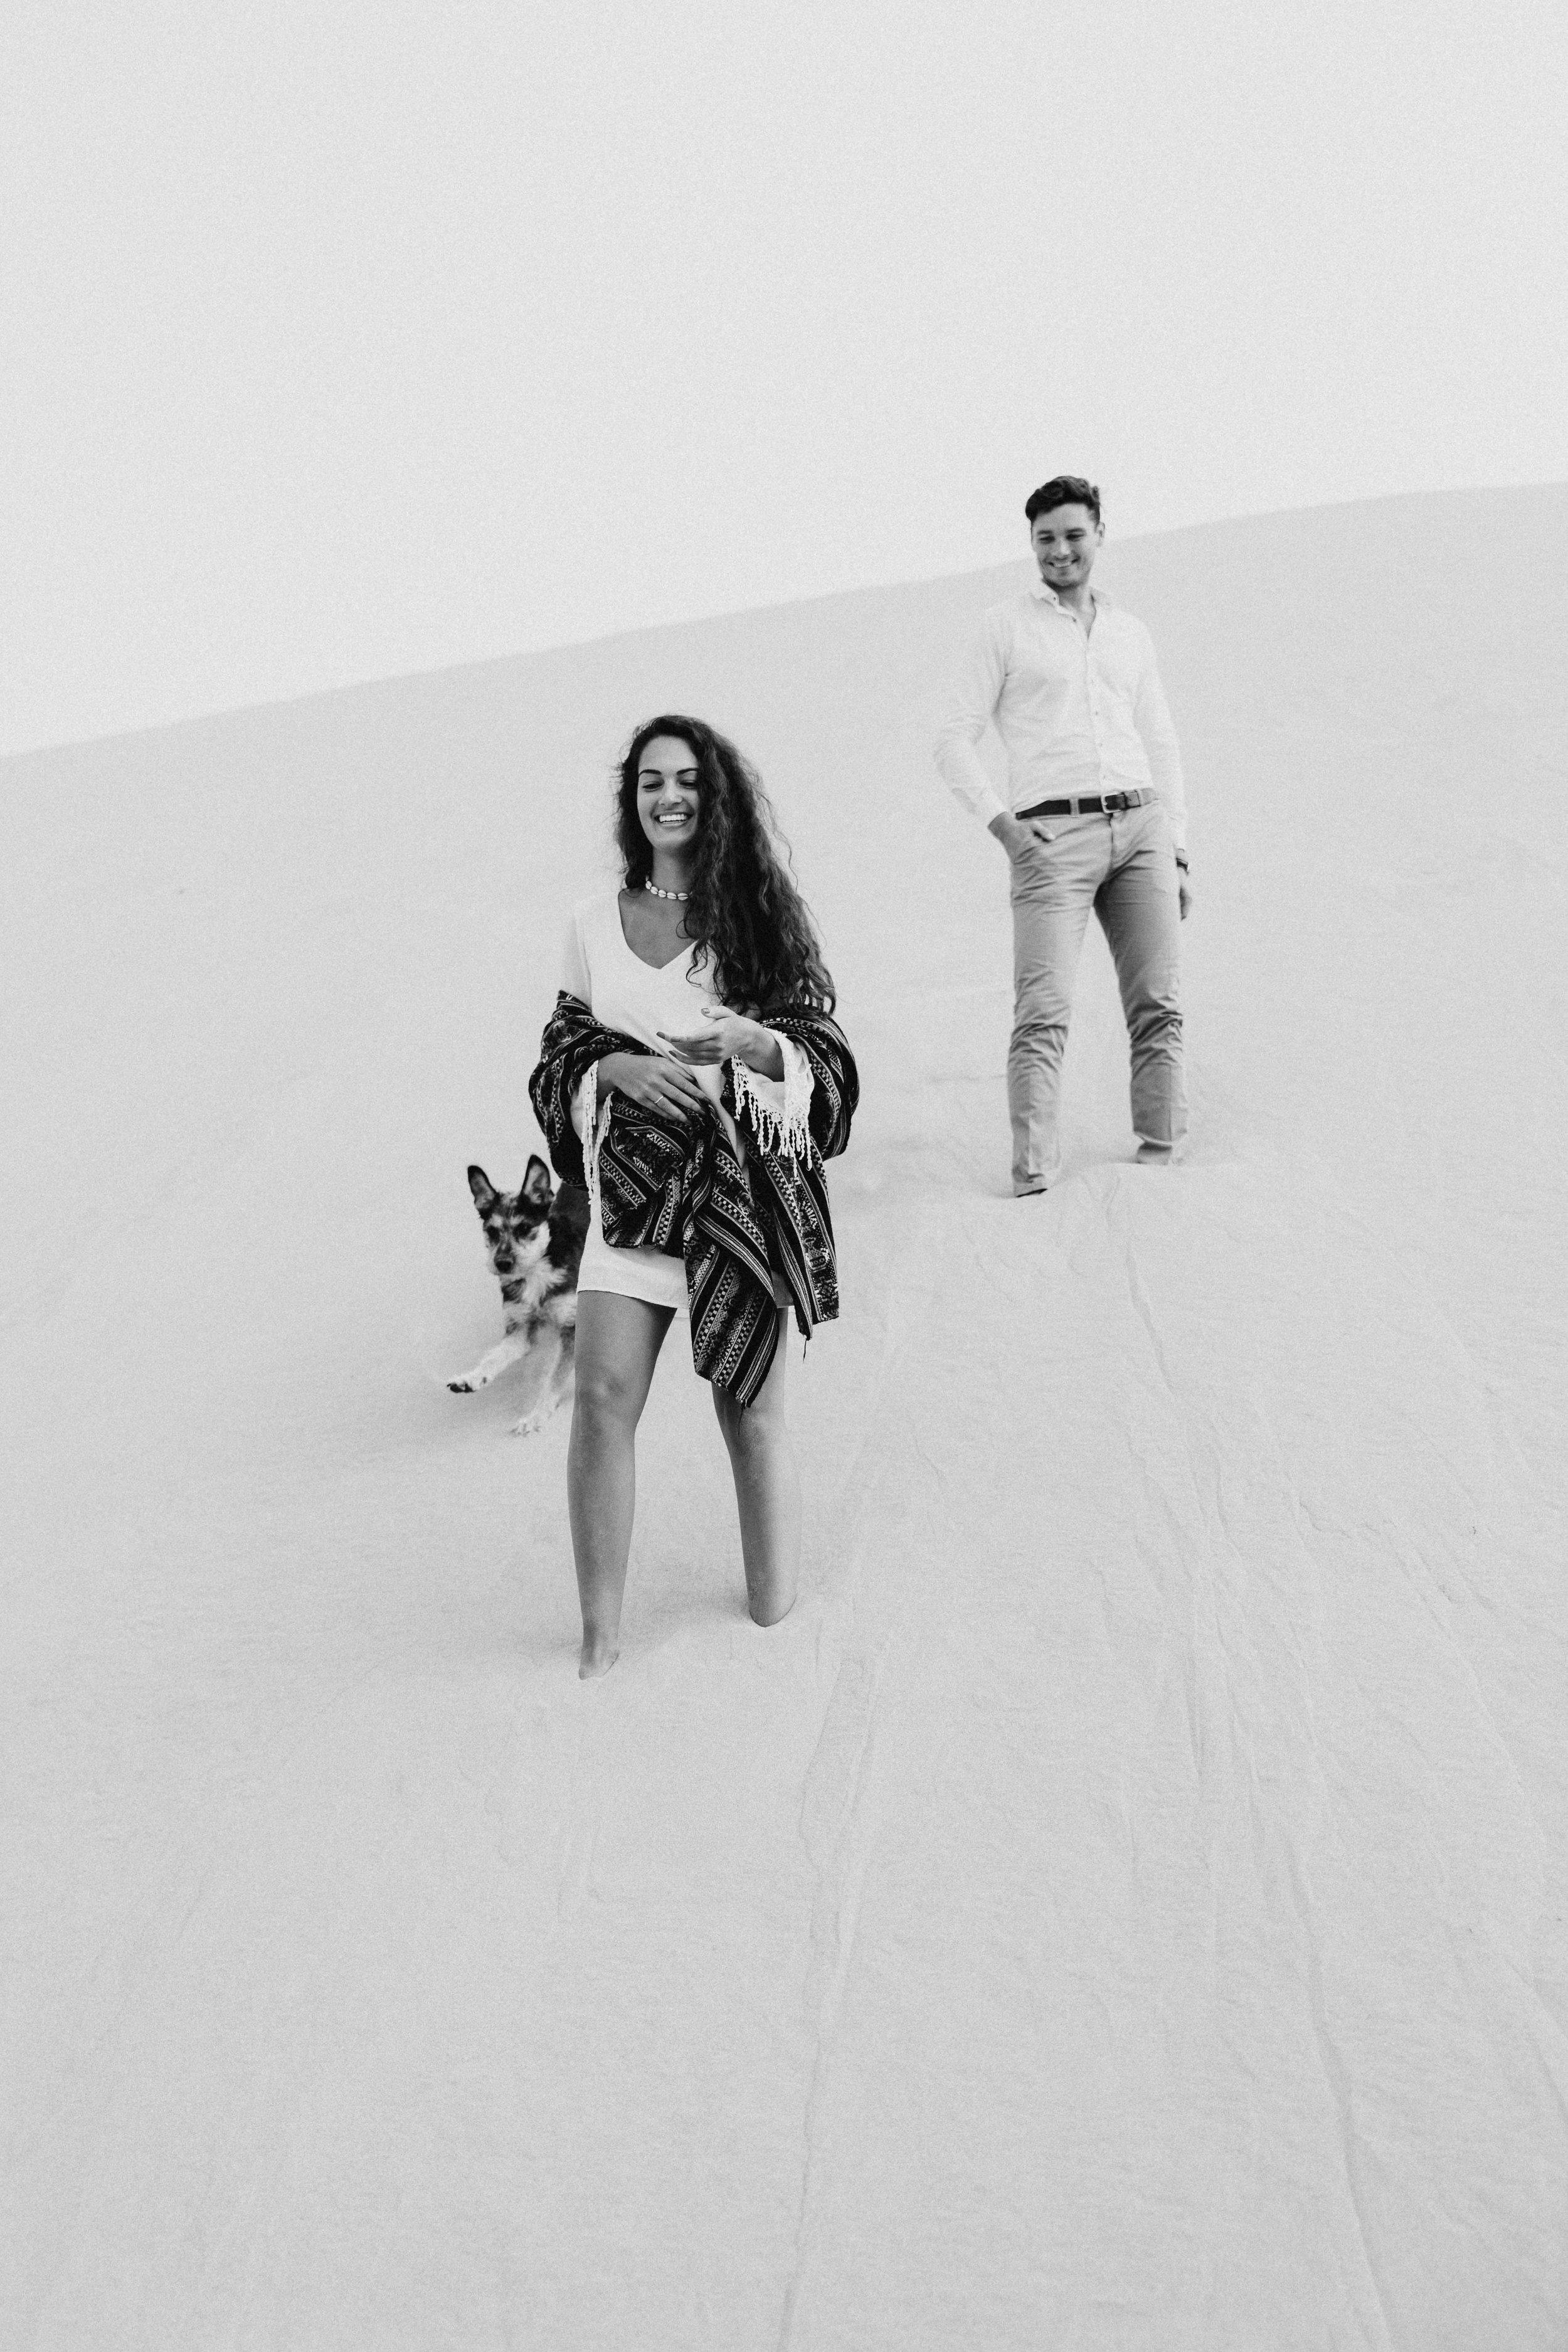 huacachina-peru-honeymoon-elopement-destination-wedding-photography-michael-cozzens-43.jpg